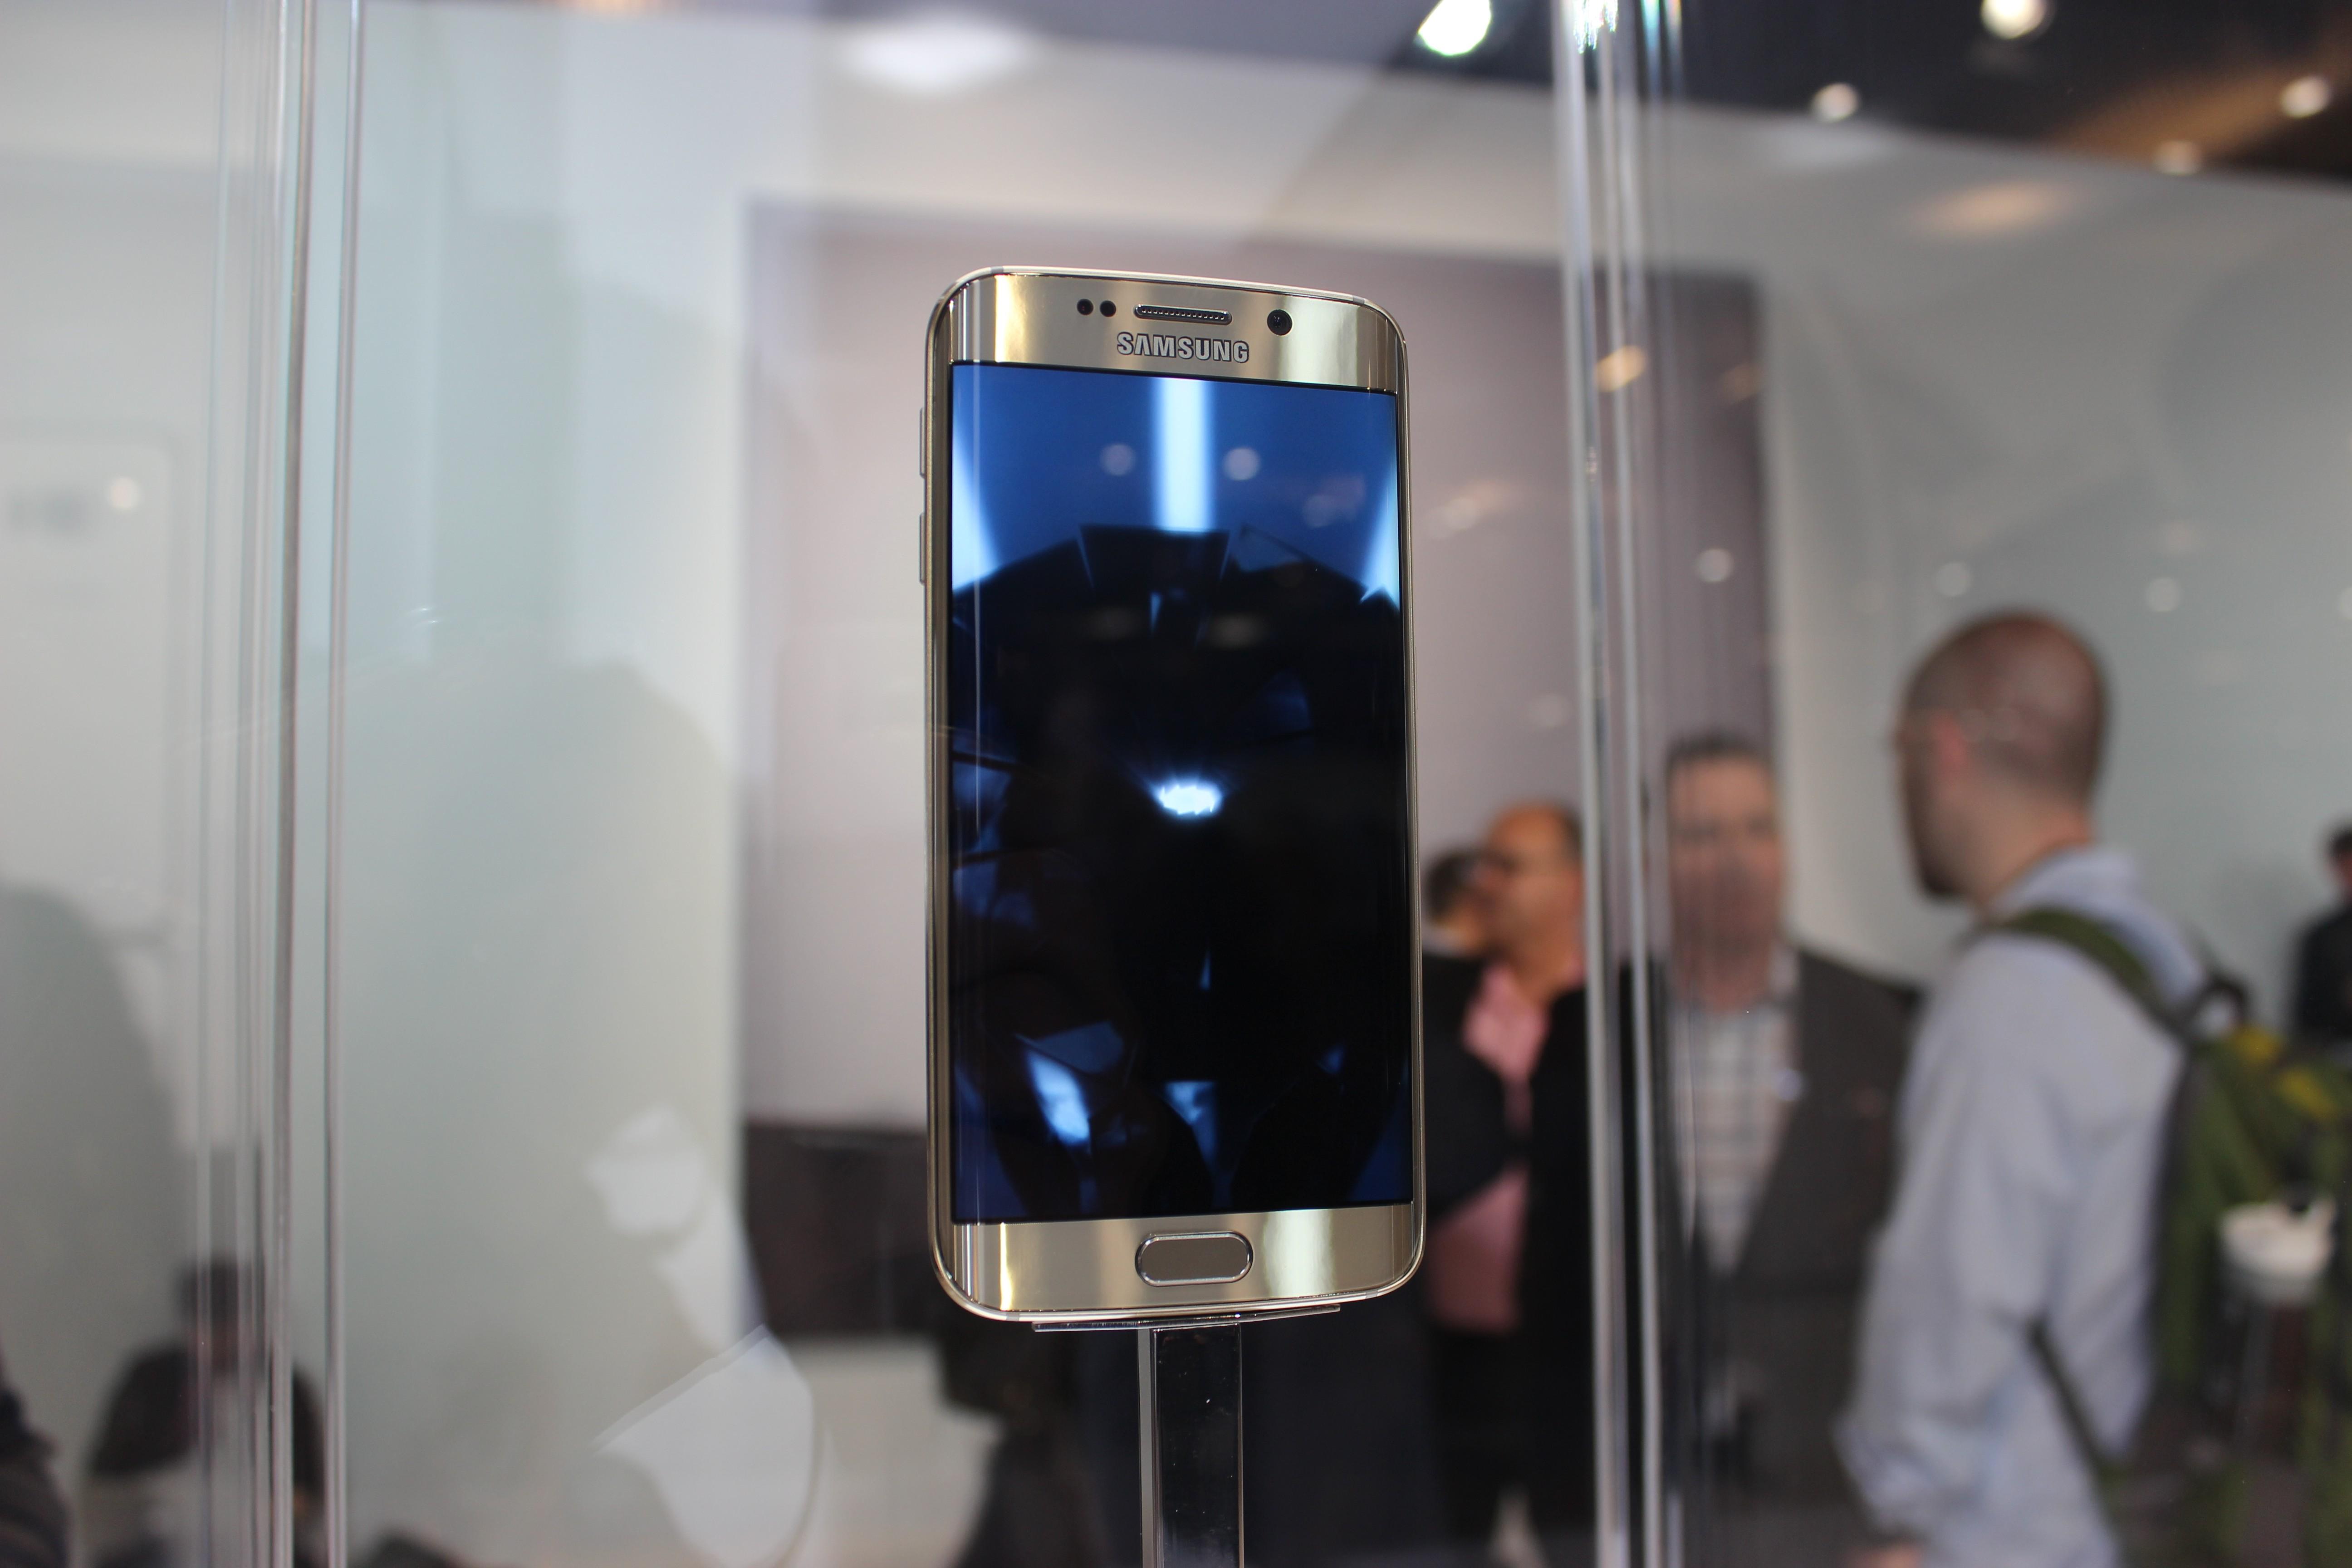 JK Shin,CEO di Samsung ritiene lo Snapdragon 810 un socket poco potente per S6